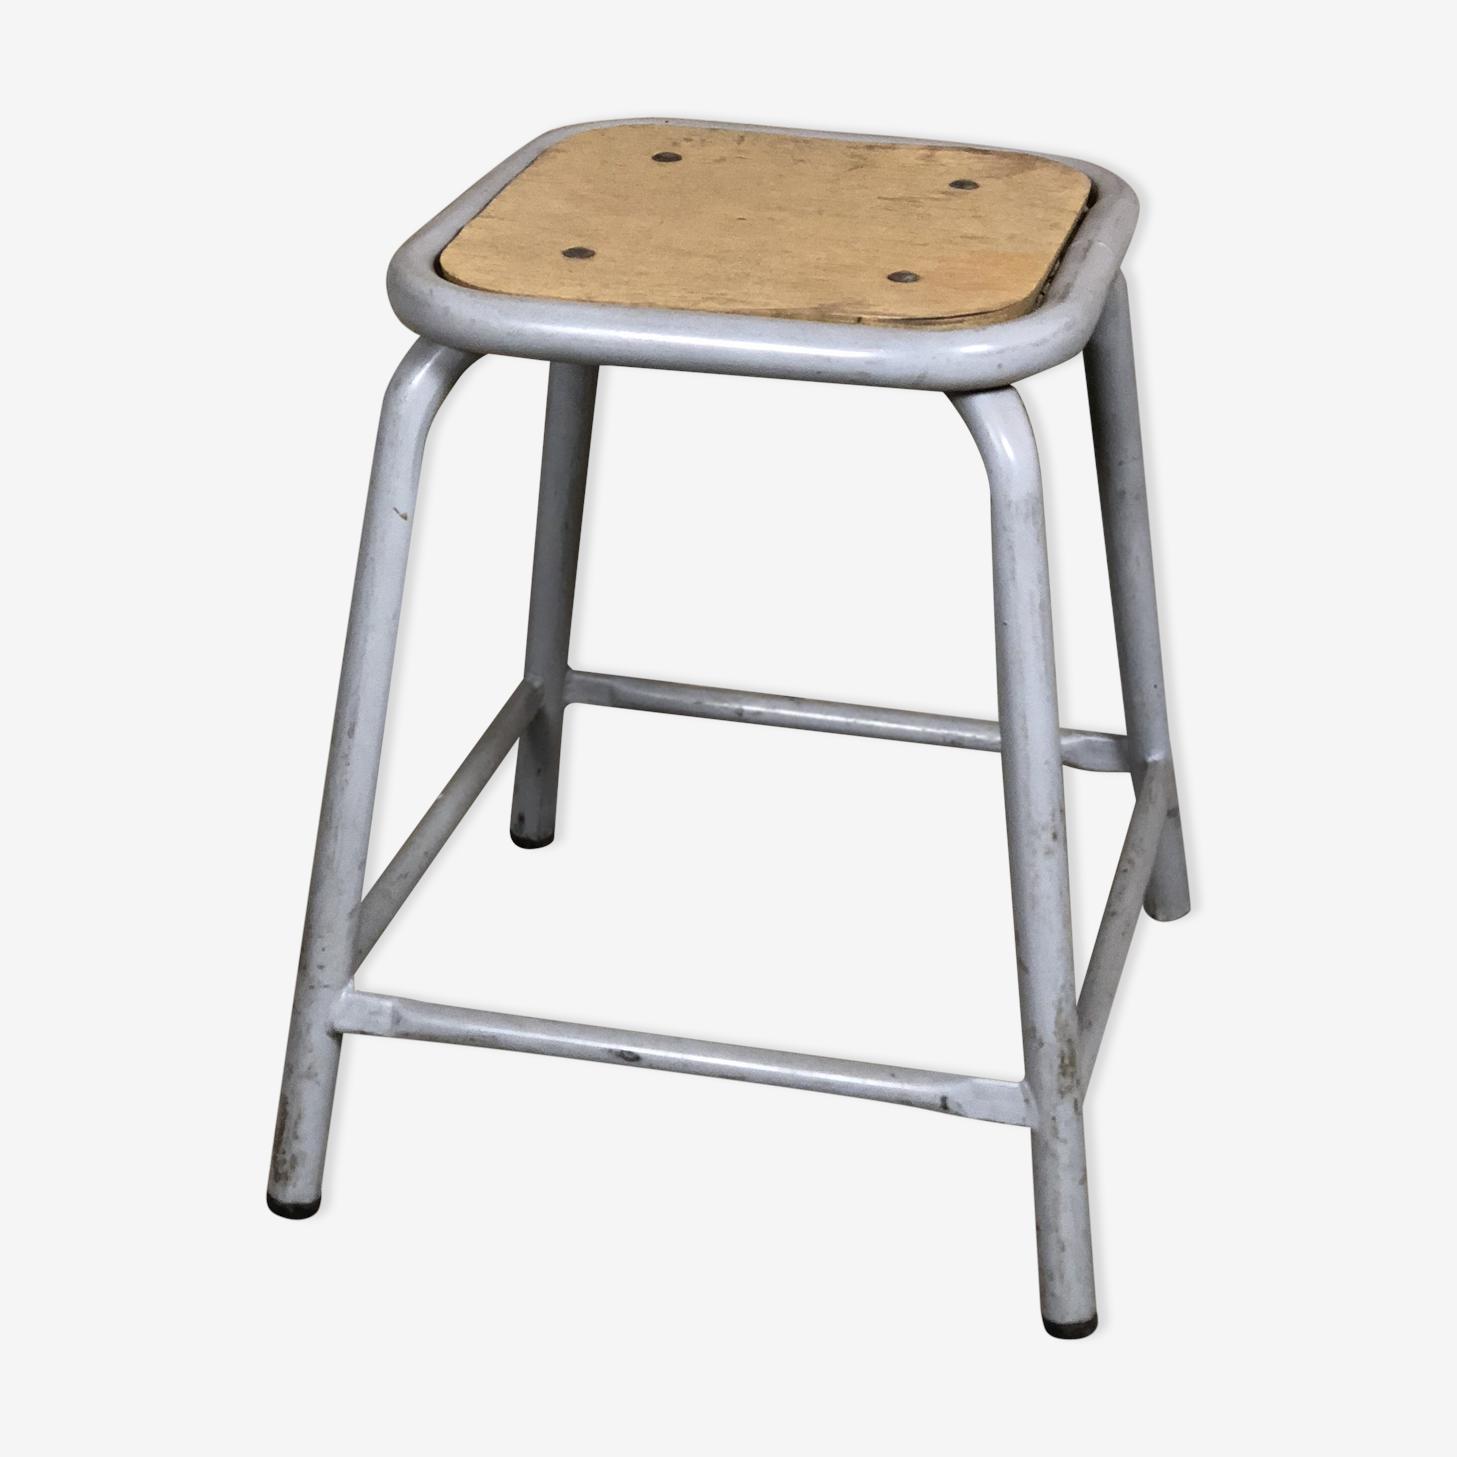 Iron and gray wood stool